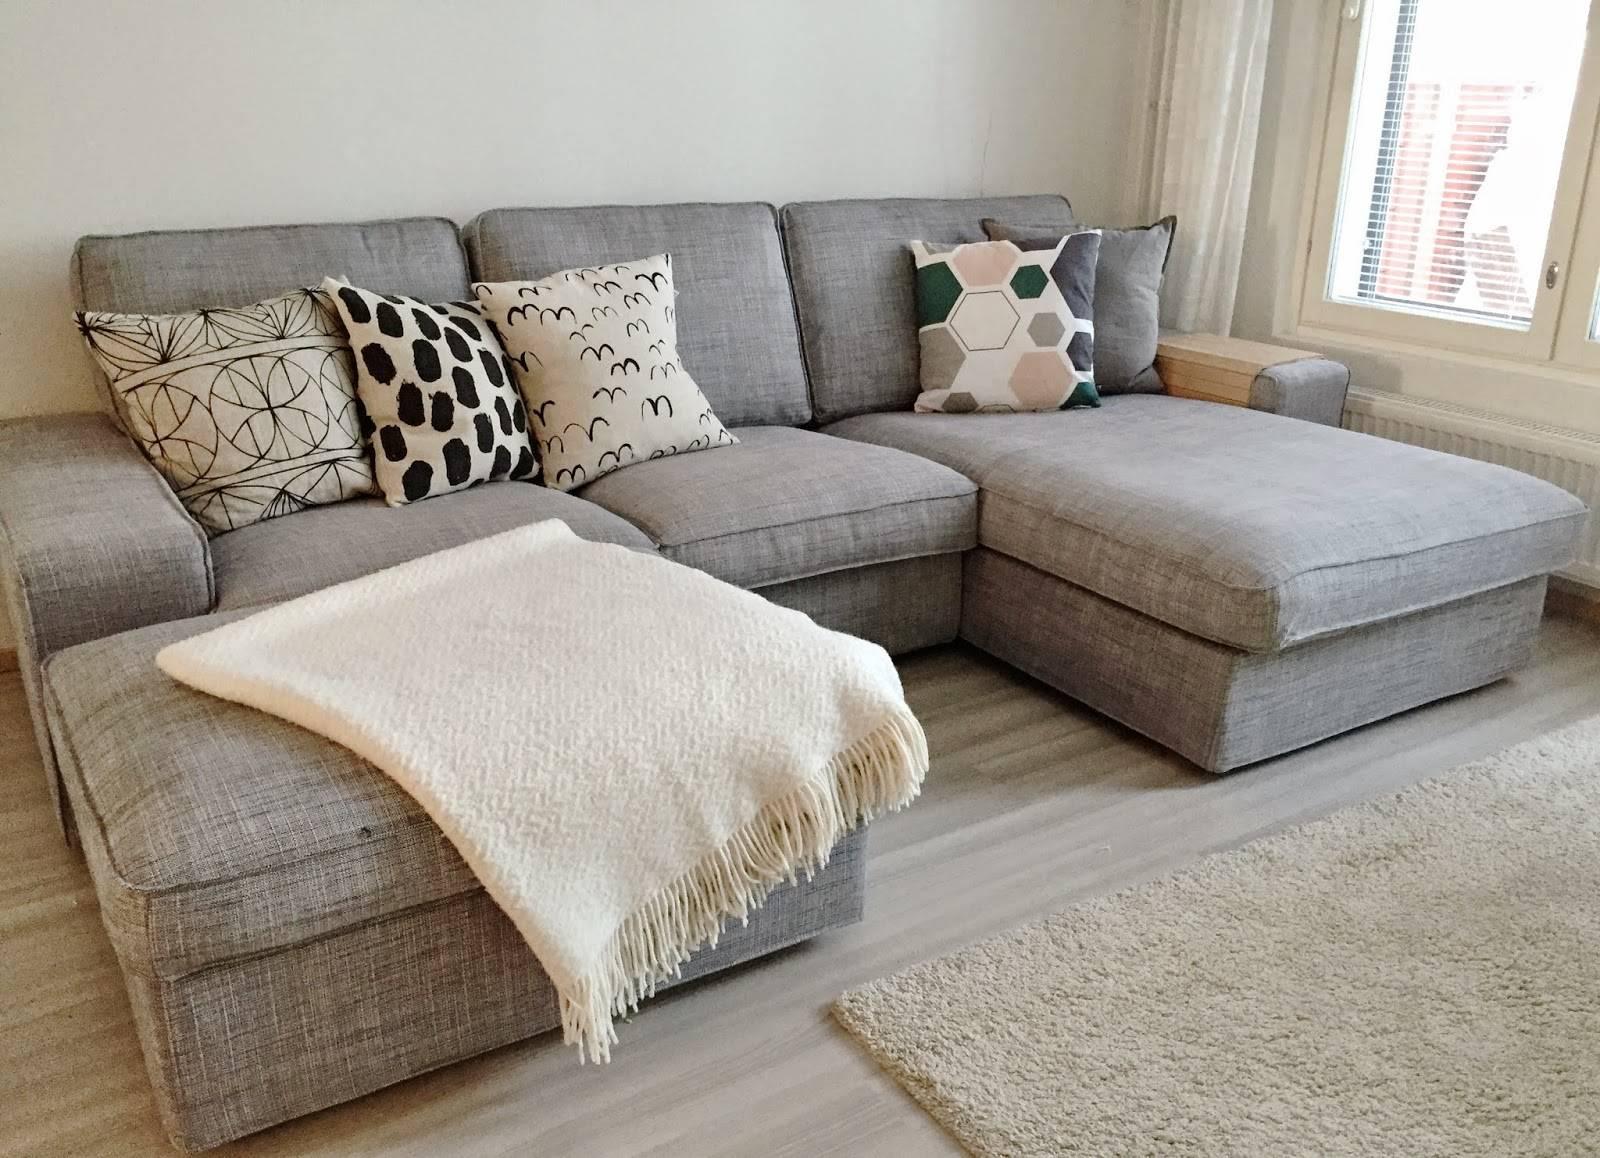 Обзор диванов от икеа - новинки 2019 года и другие модели